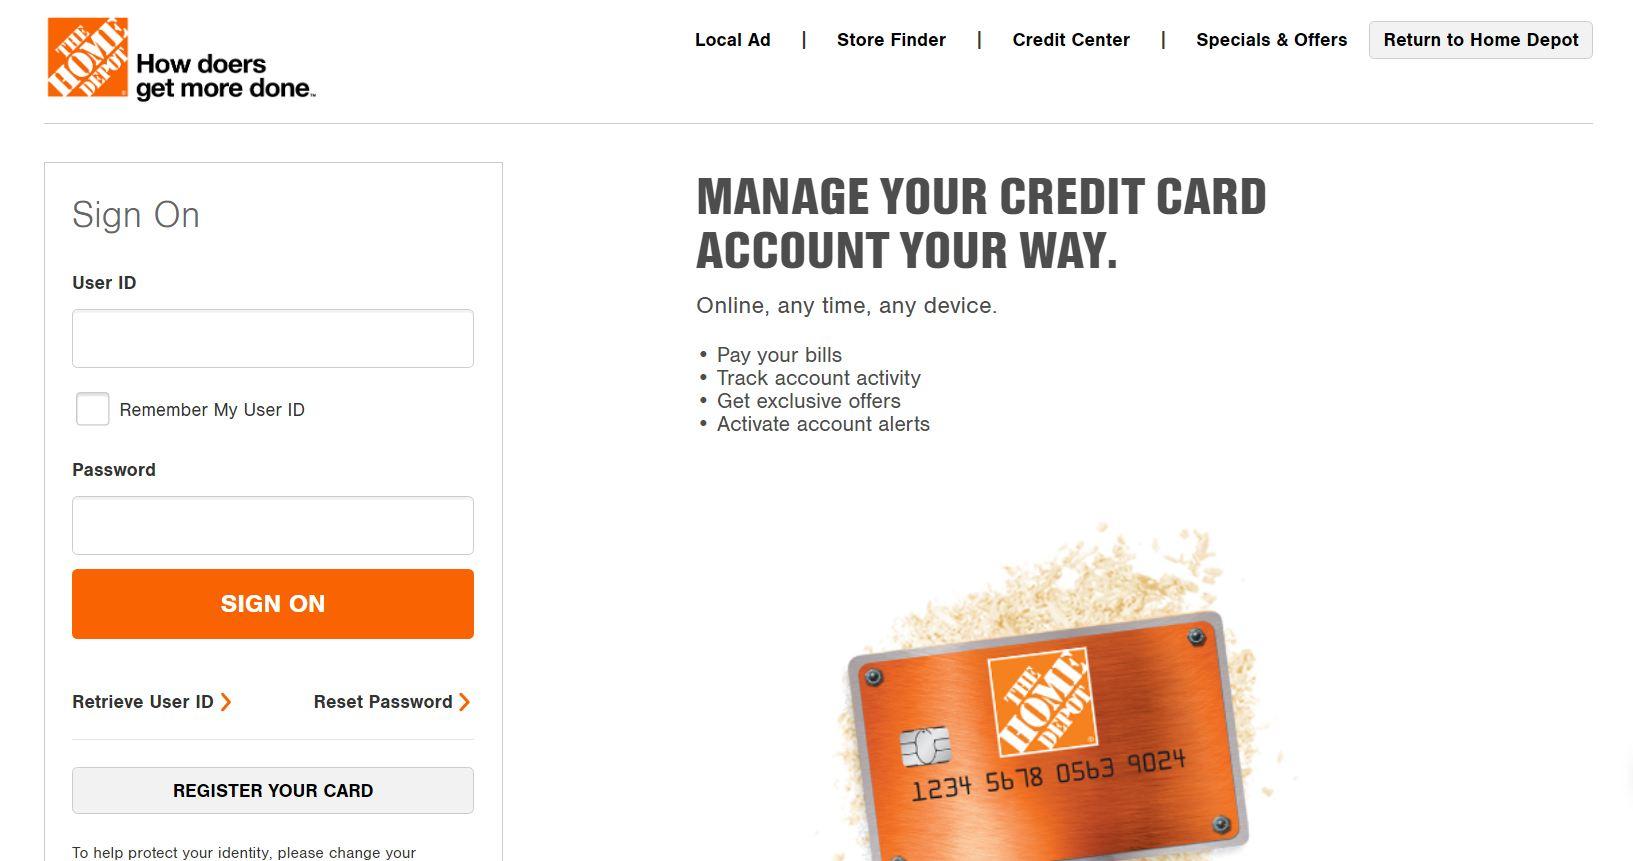 Myhomedepotaccount.com - My Home Depot Account Card Login